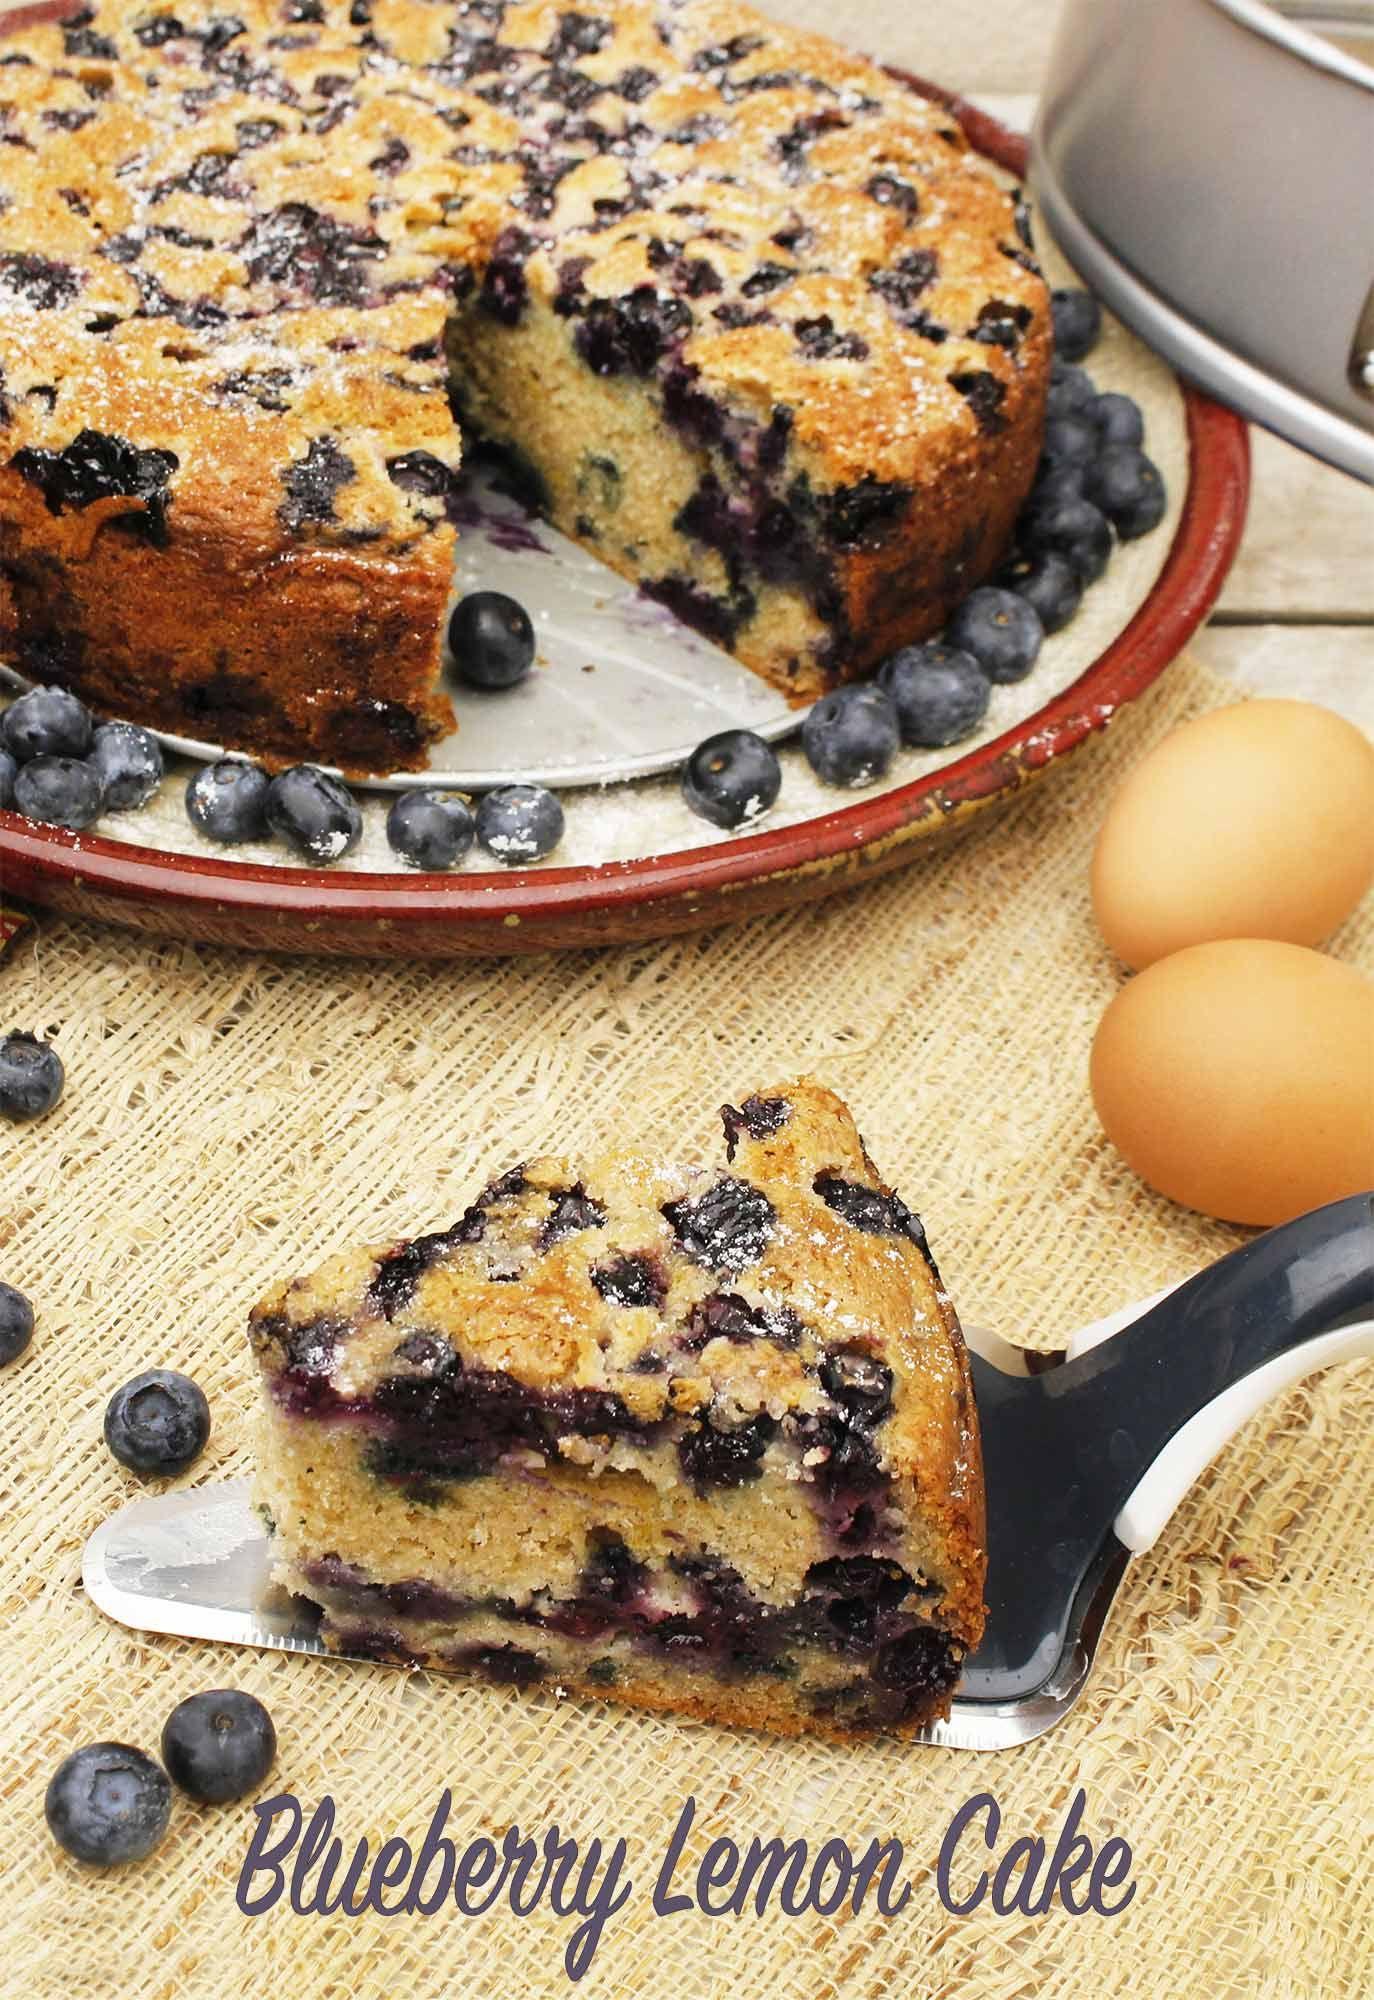 Blueberry lemon cake recipe baking recipes non